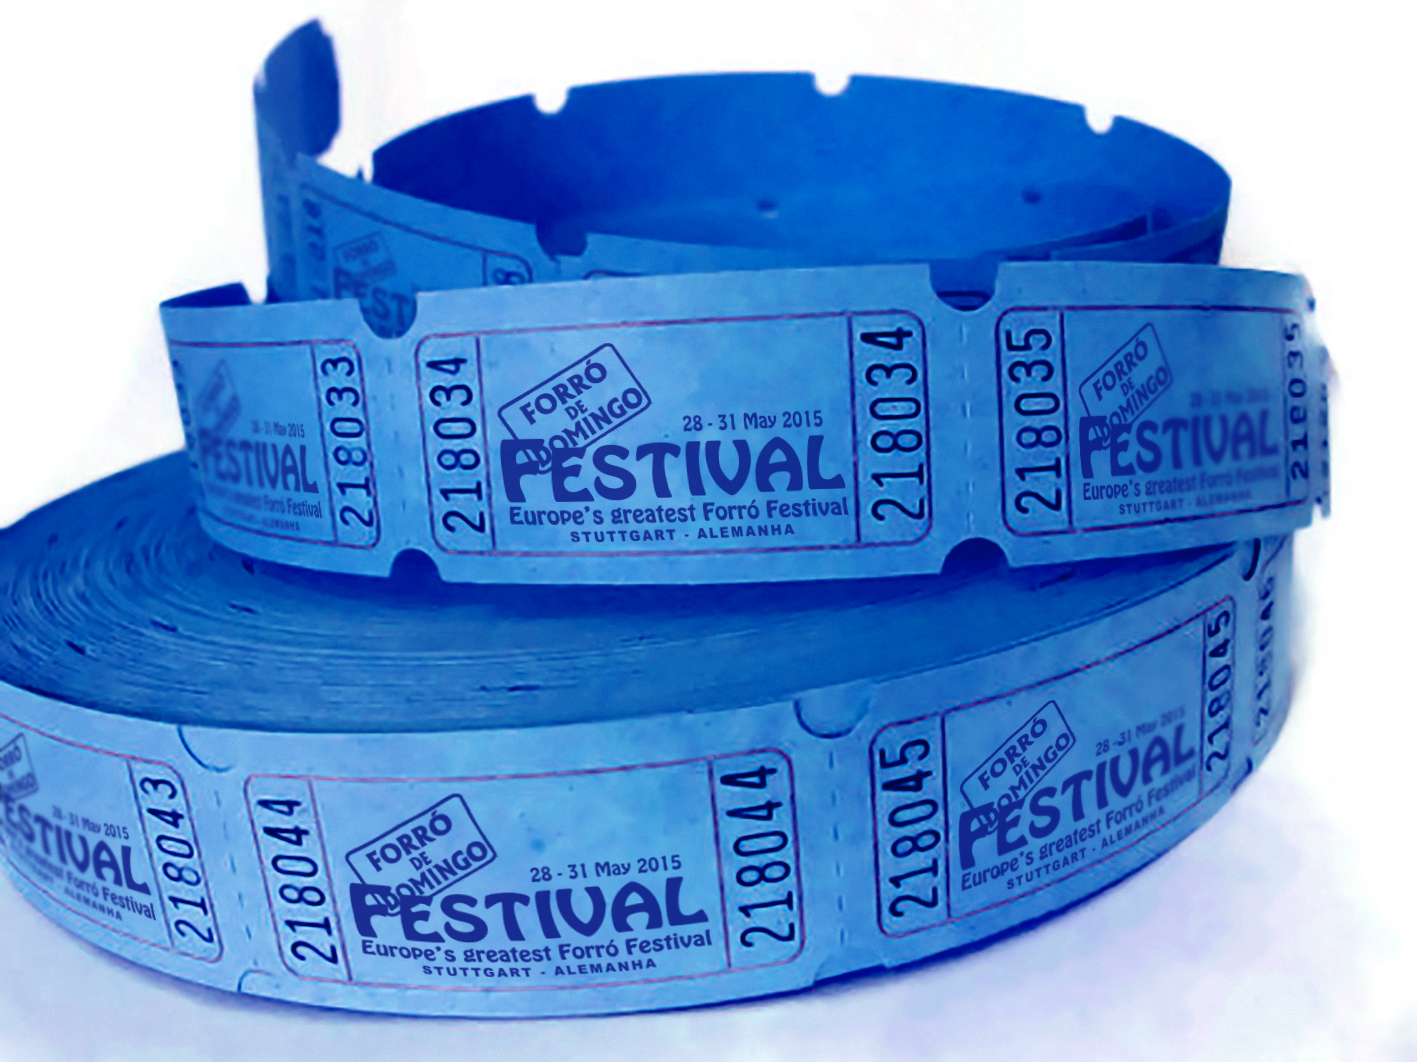 https://forrofestival.com/wp-content/uploads/2015/02/FdD-ticket_3-dias.jpg